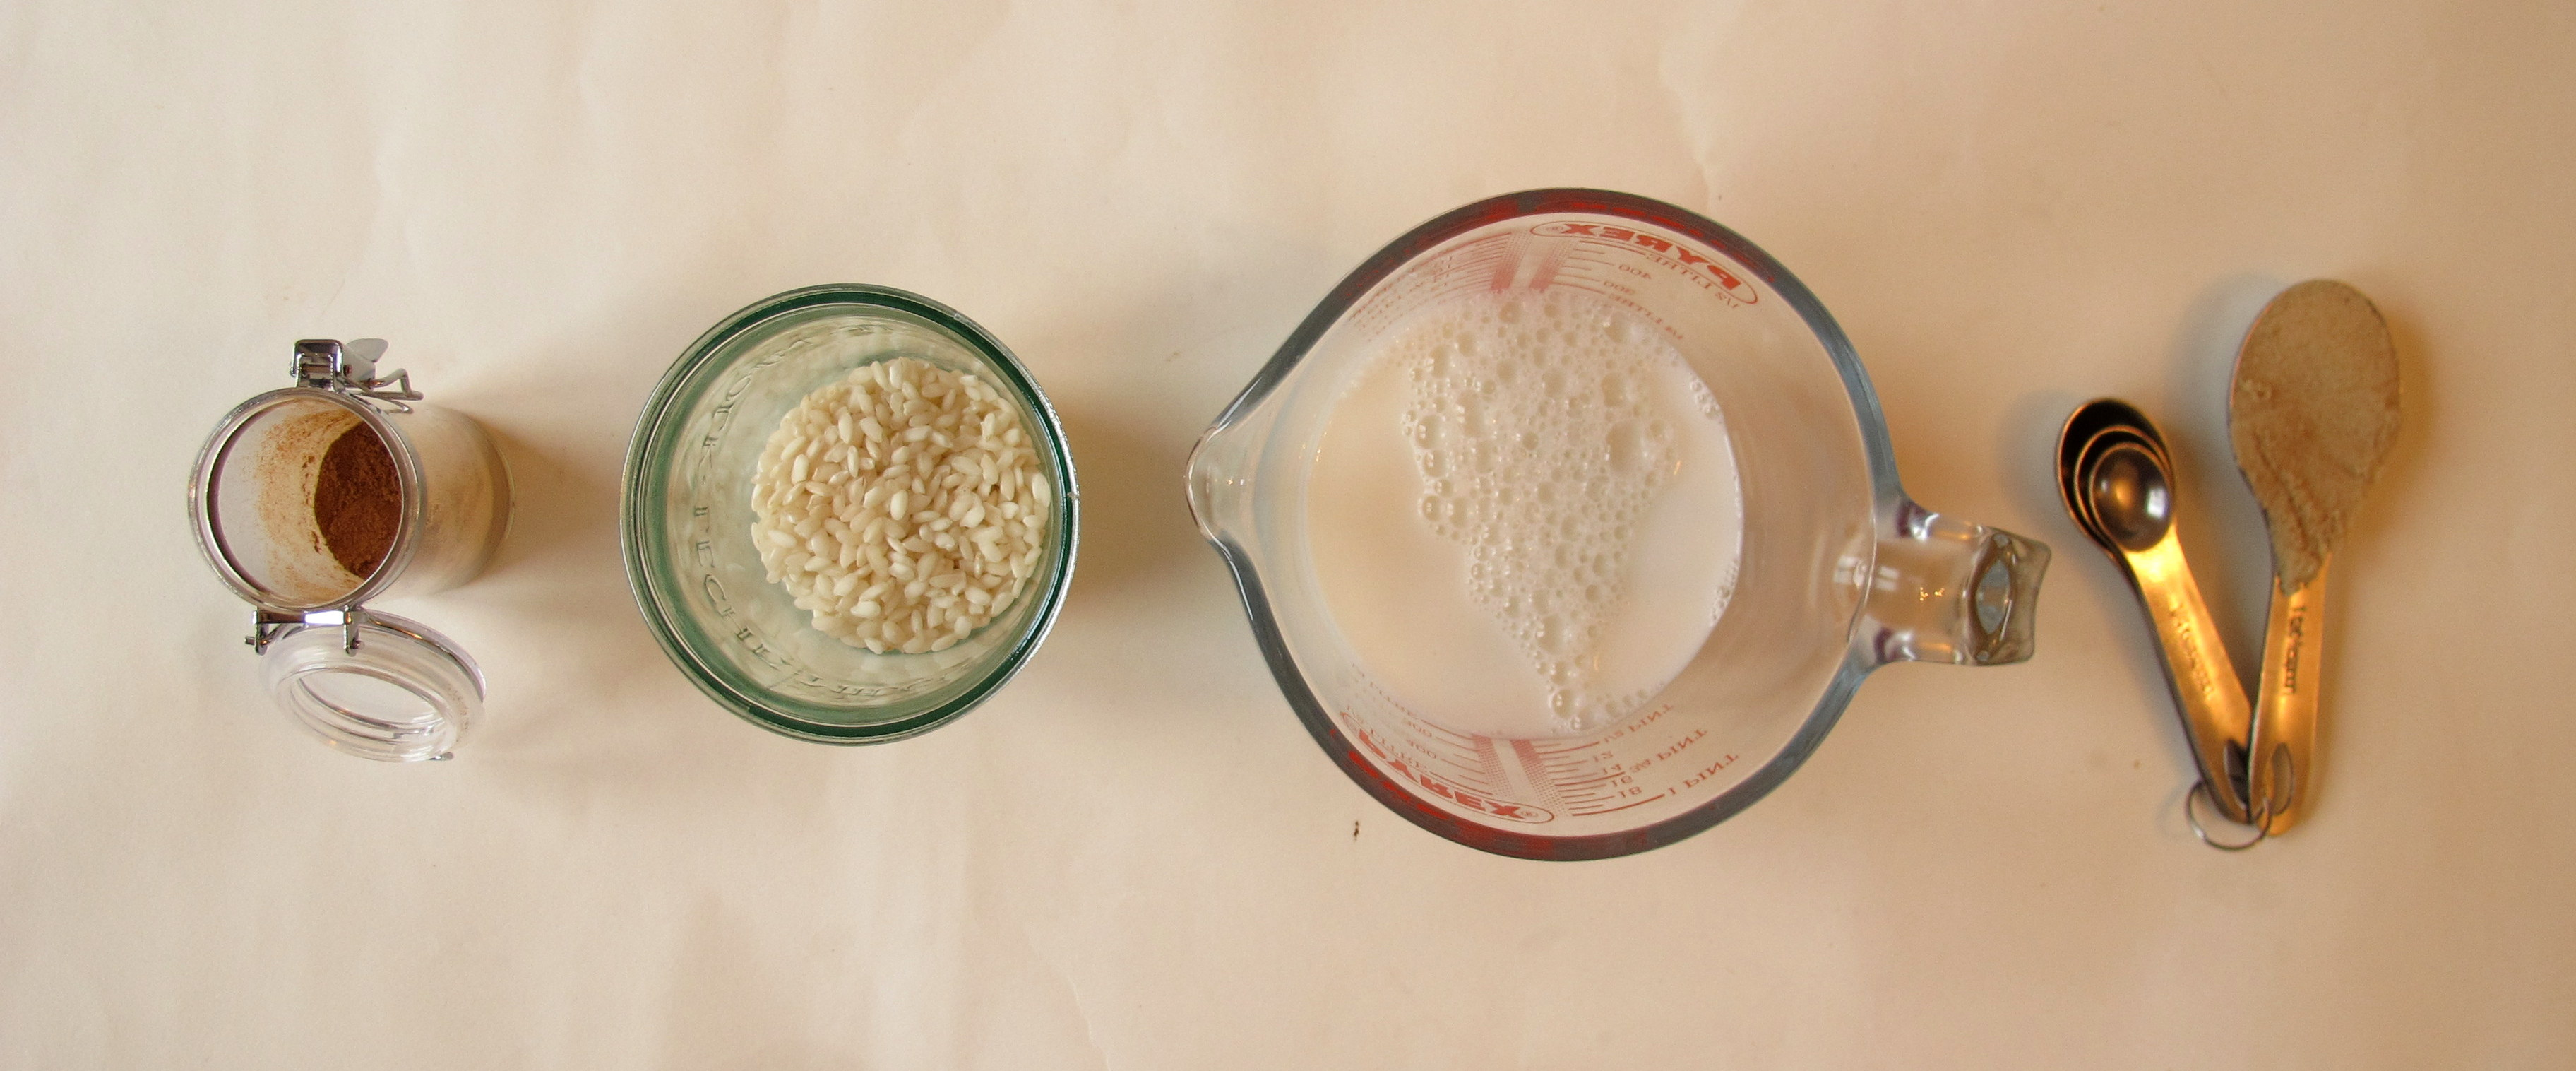 Risotto Rice Pudding With Brown Sugar And Vanilla Recipes — Dishmaps